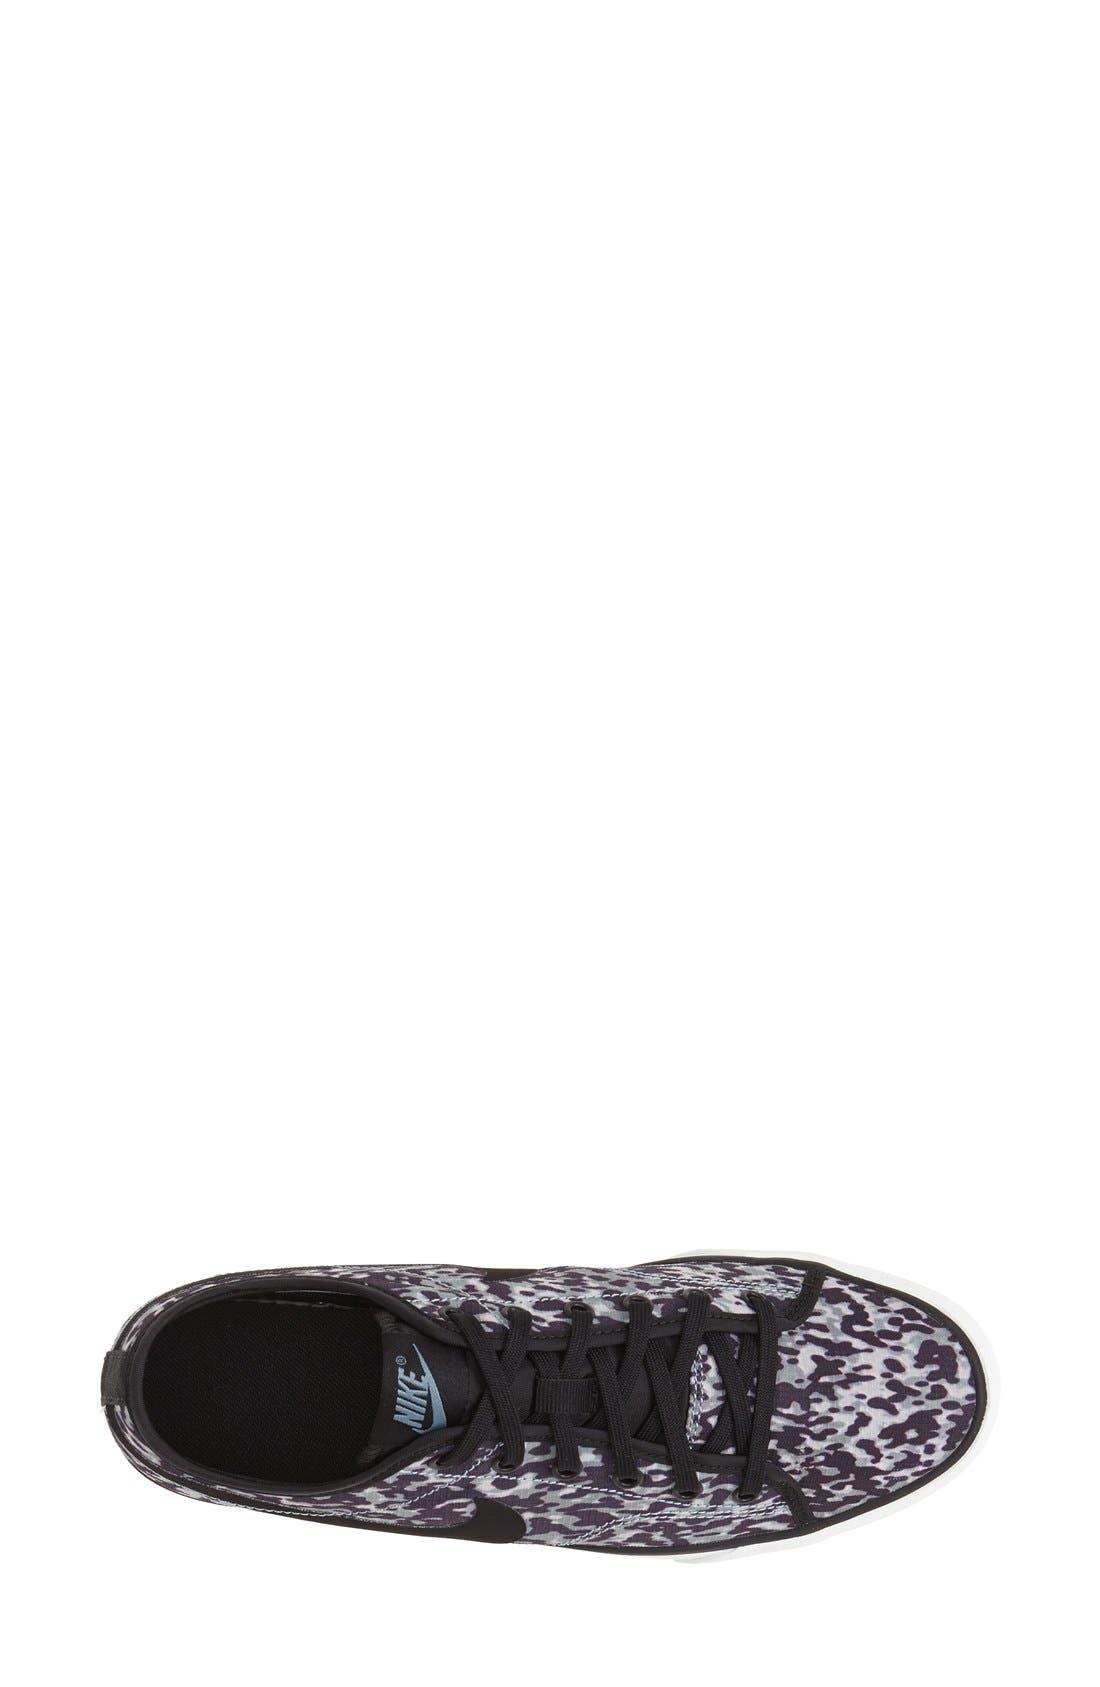 Alternate Image 3  - Nike 'Primo - Court' Printed Canvas Sneaker (Women)